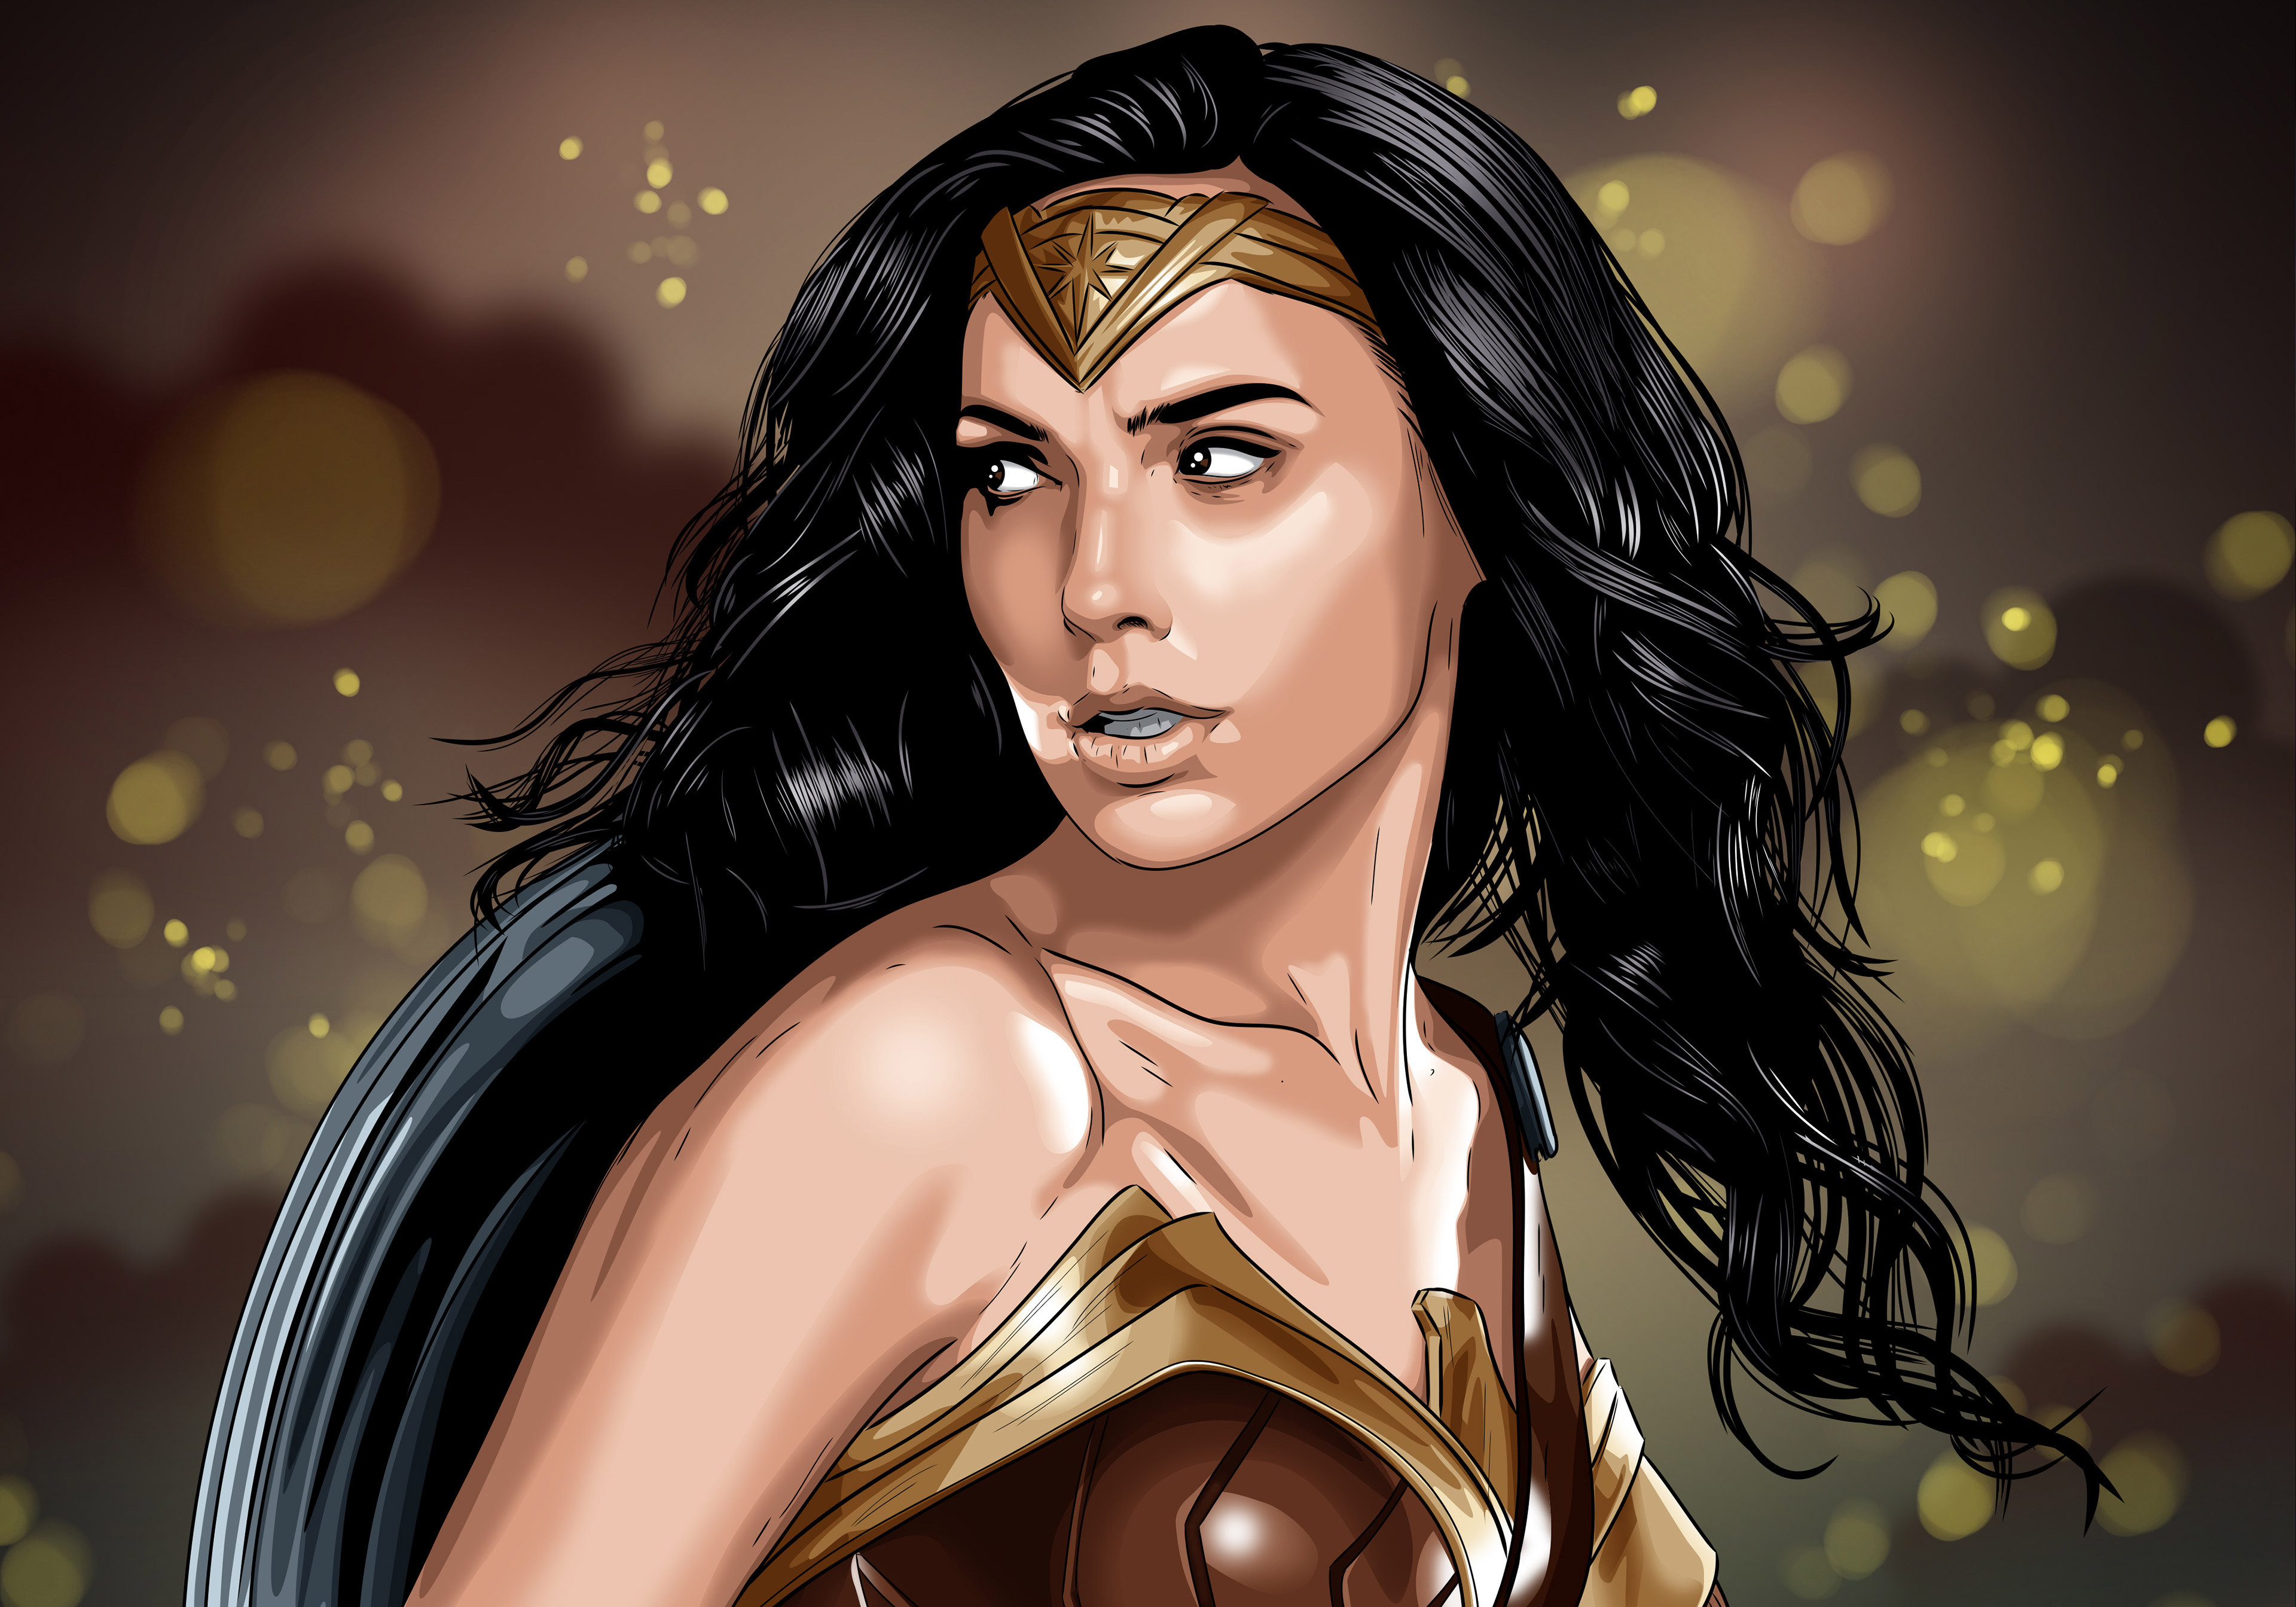 Wallpaper Wonder Woman Hd 4k 8k Movies 9526: Wonder Woman Artwork 4k, HD Artist, 4k Wallpapers, Images